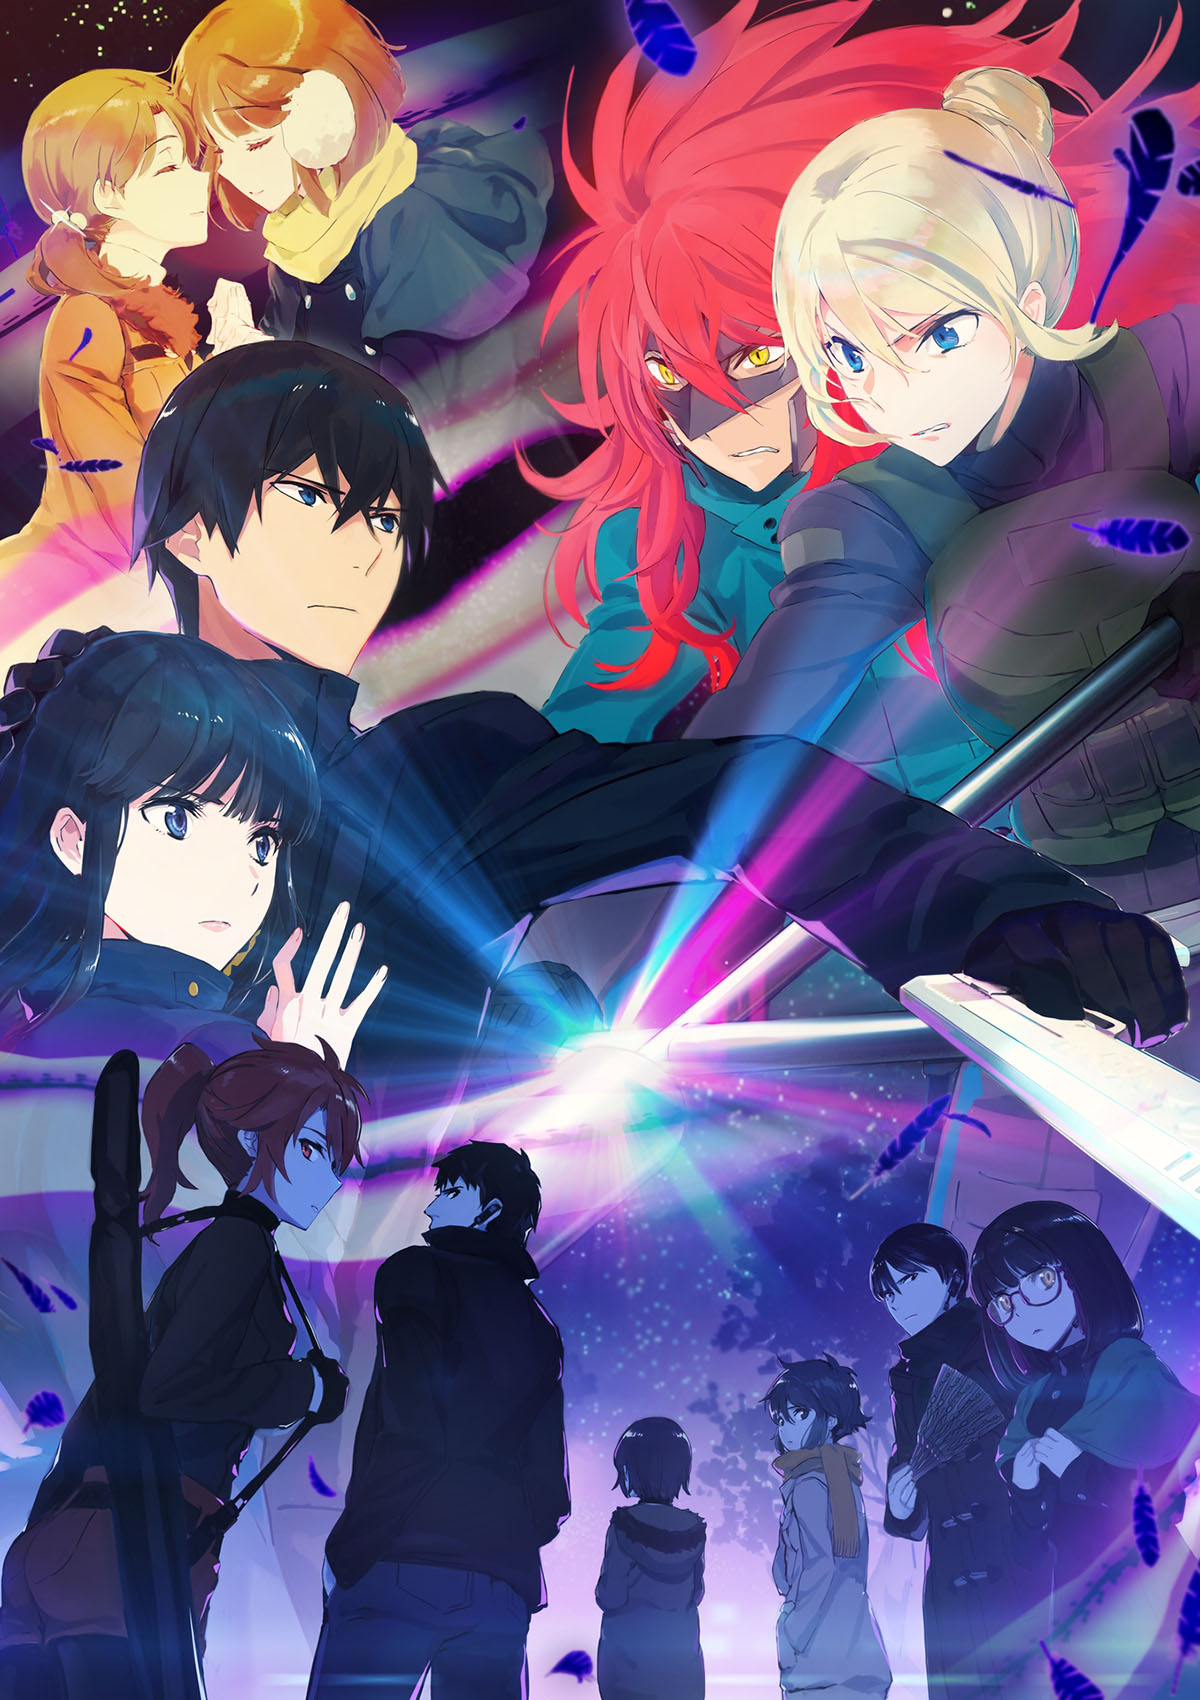 The Irregular at Magic High School Anime Season 2 Anime Key Visual Mahouka Koukou no Rettousei Season 2